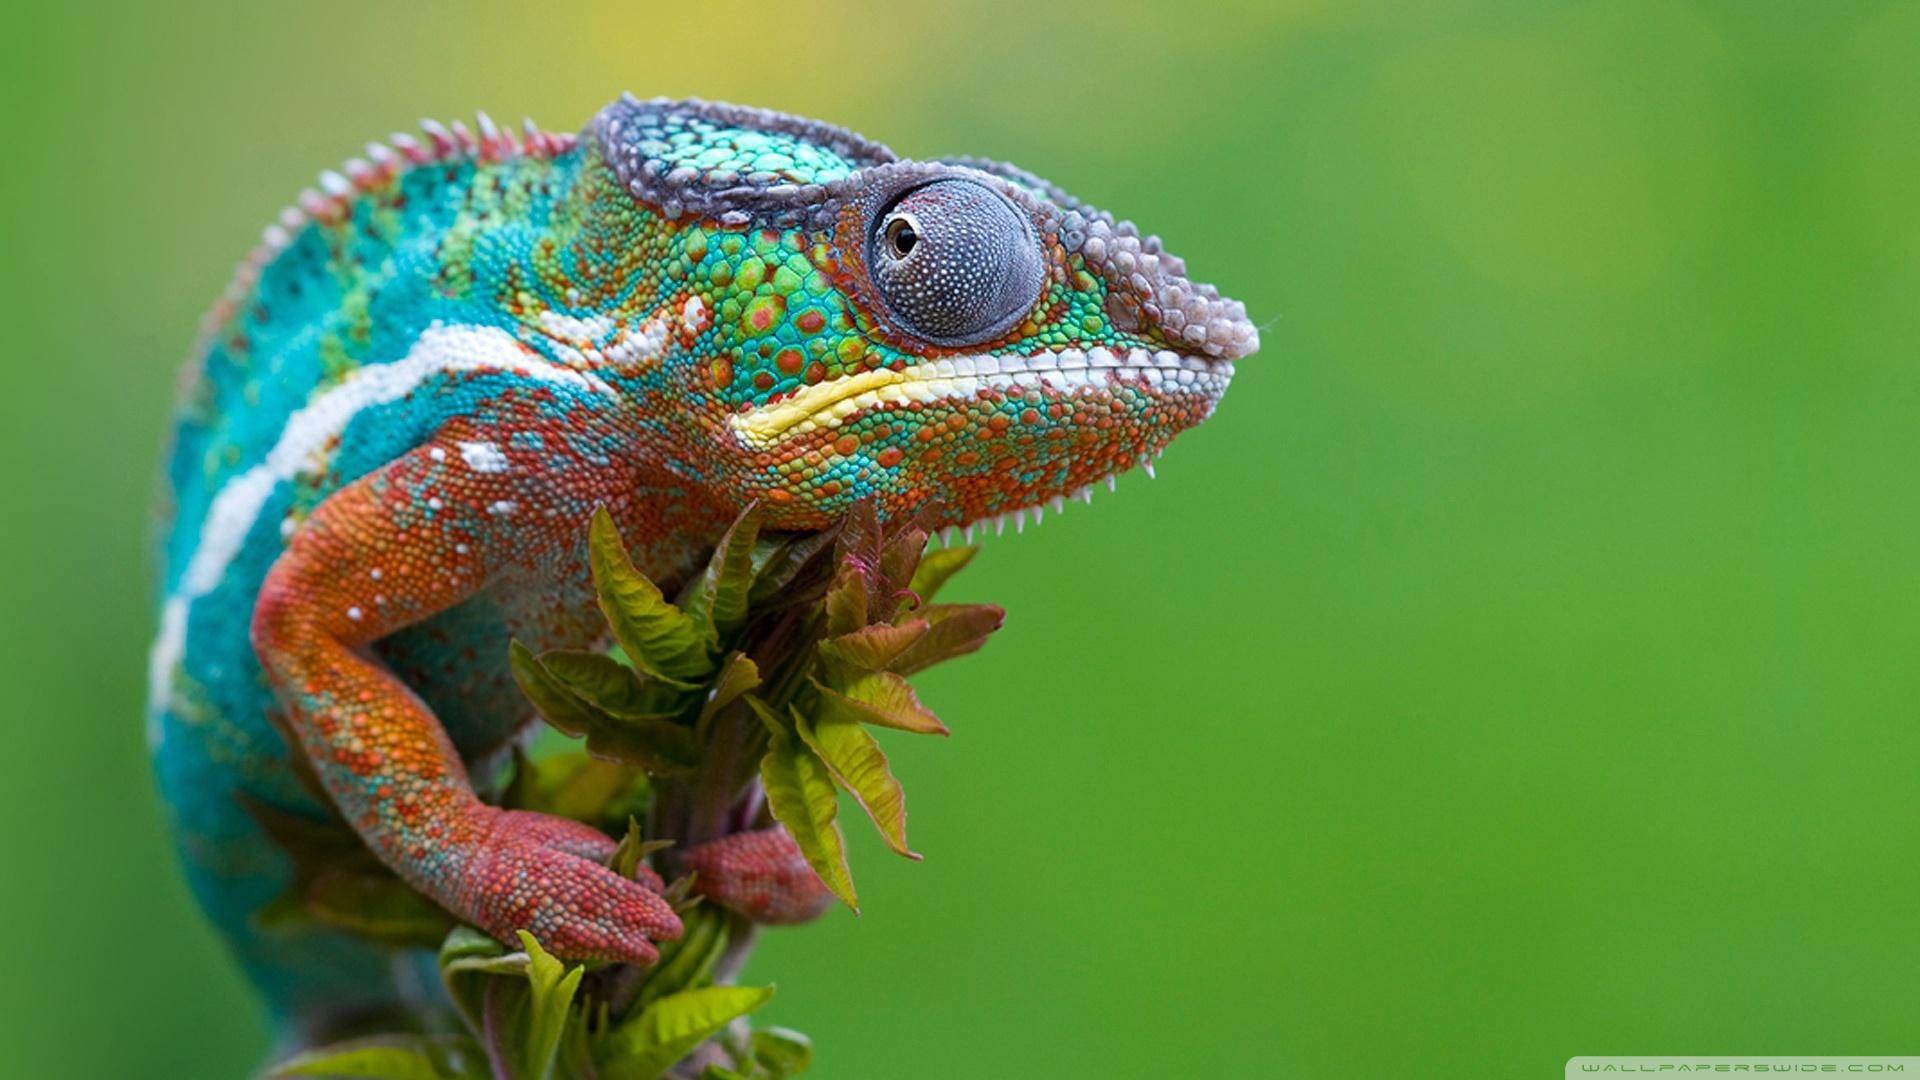 1920x1080 Colored Chameleon wallpaper